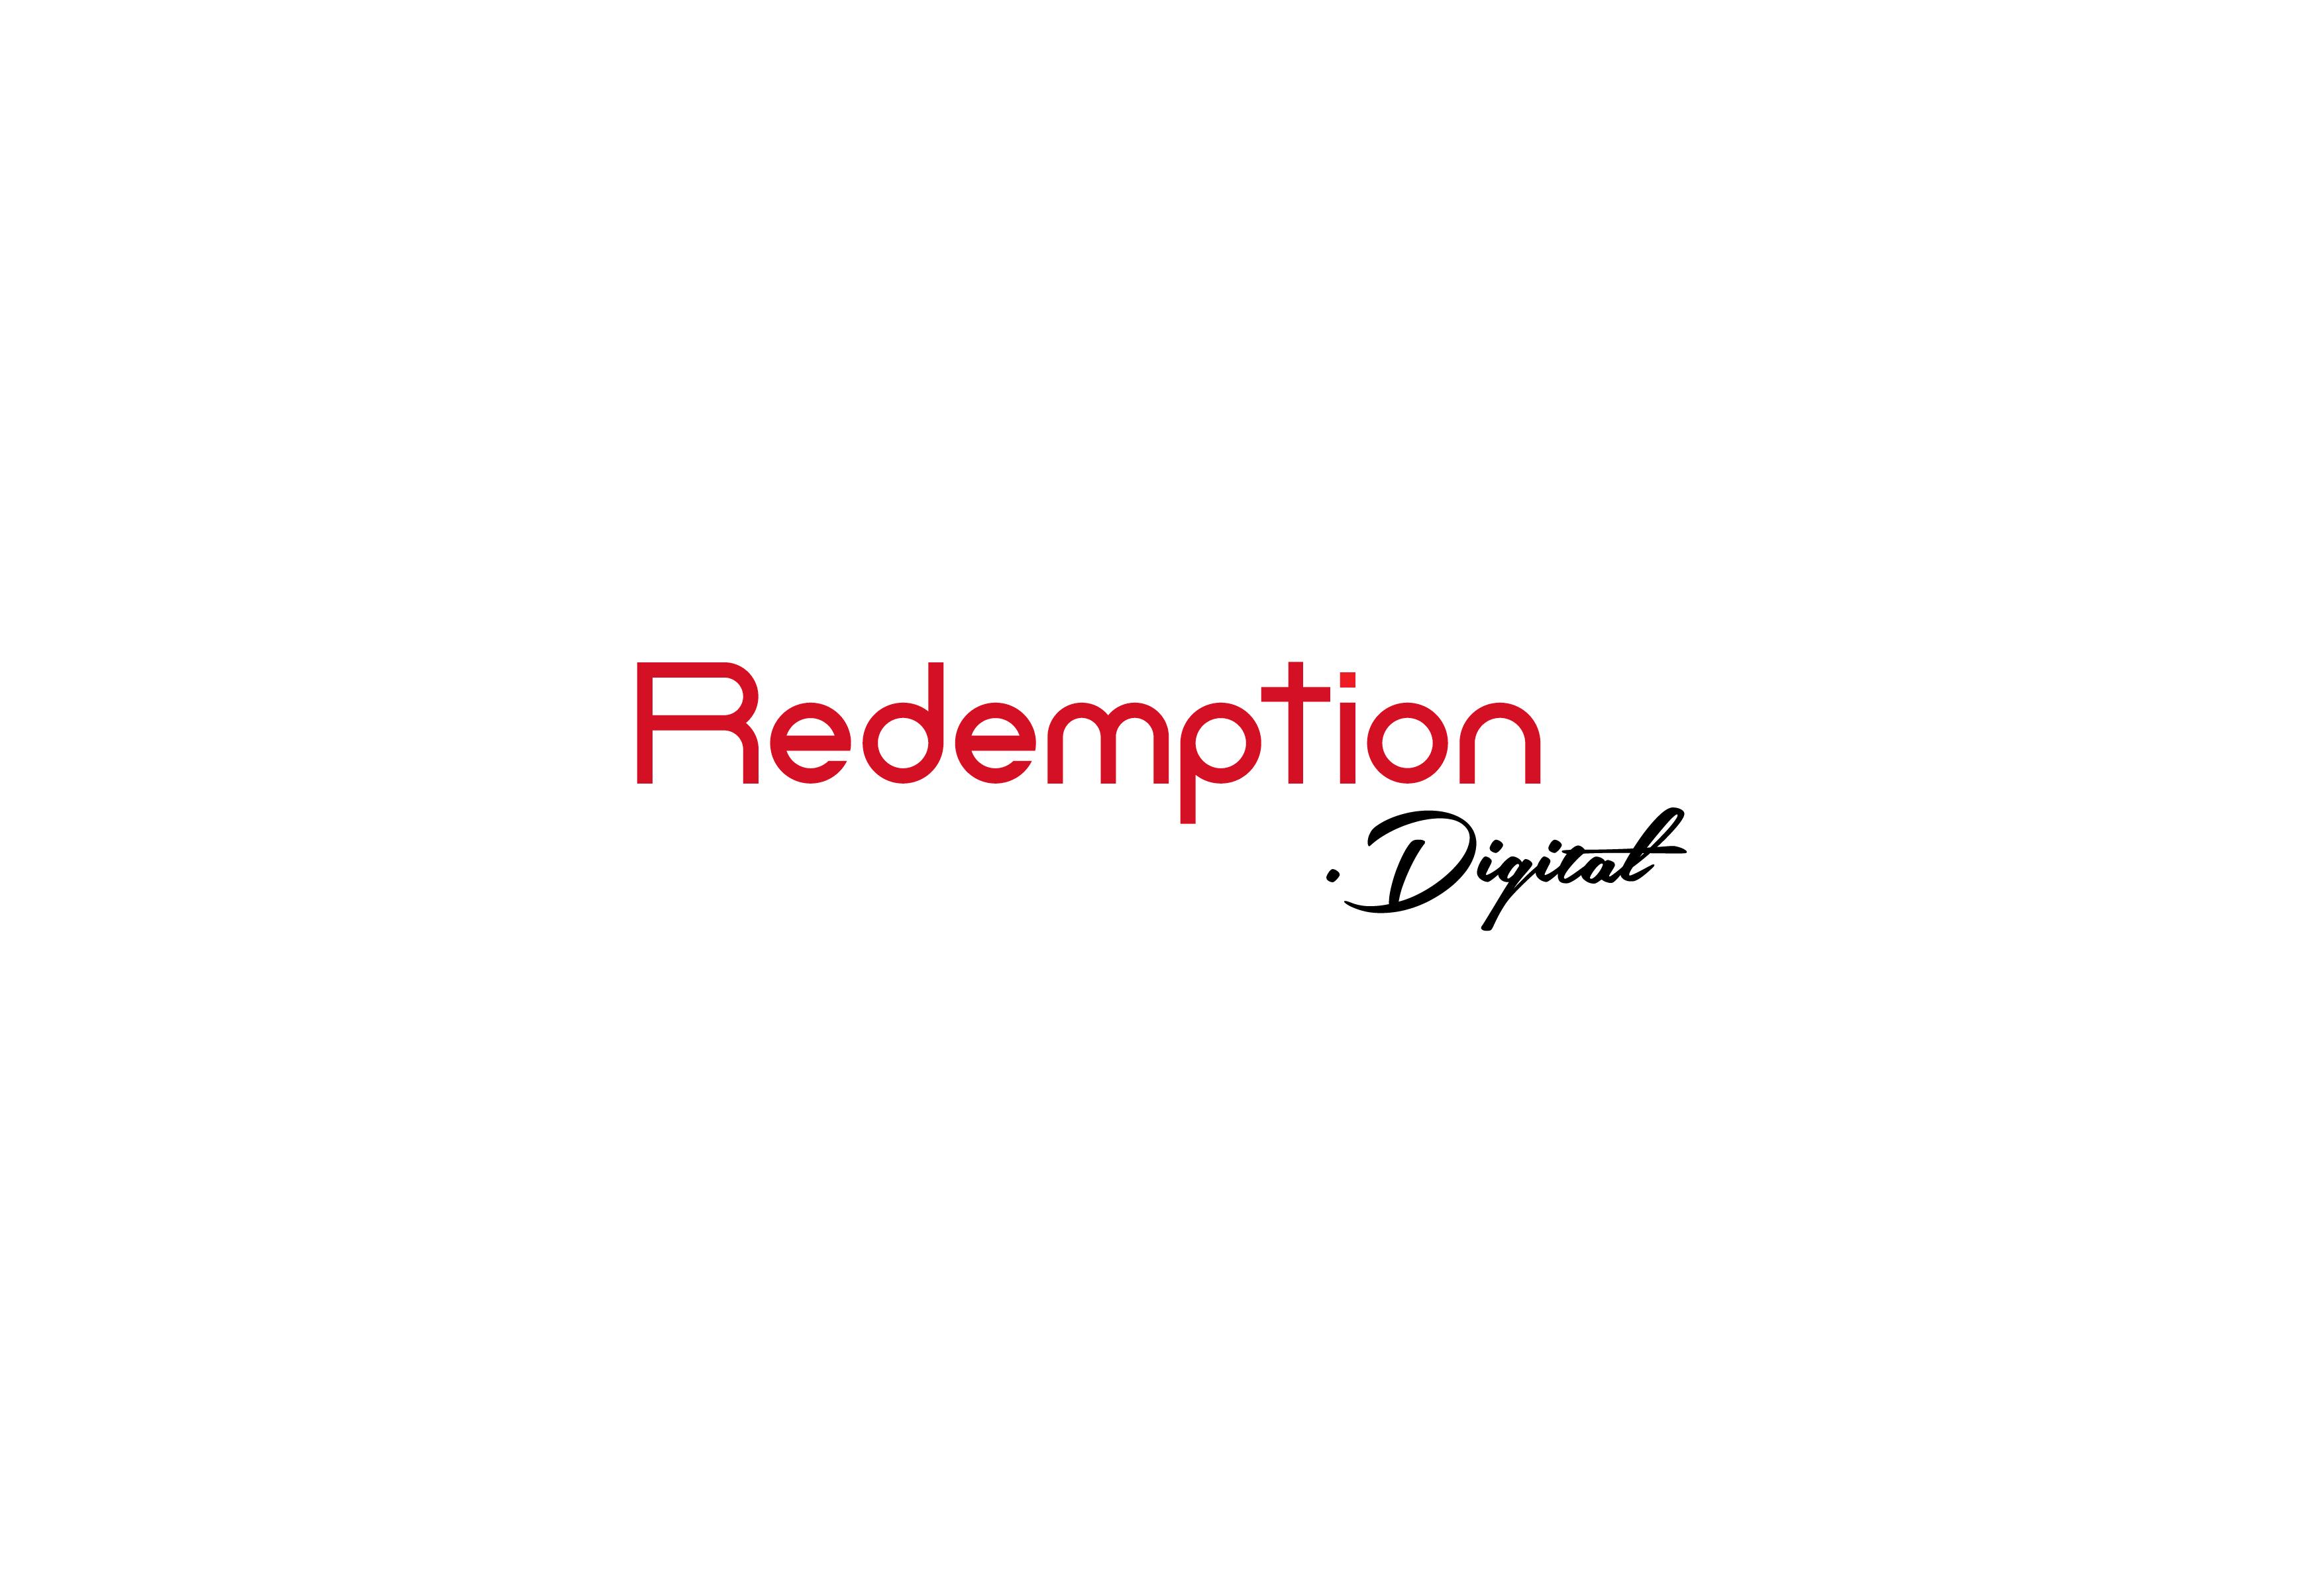 Redemption Digital Marketing Logo